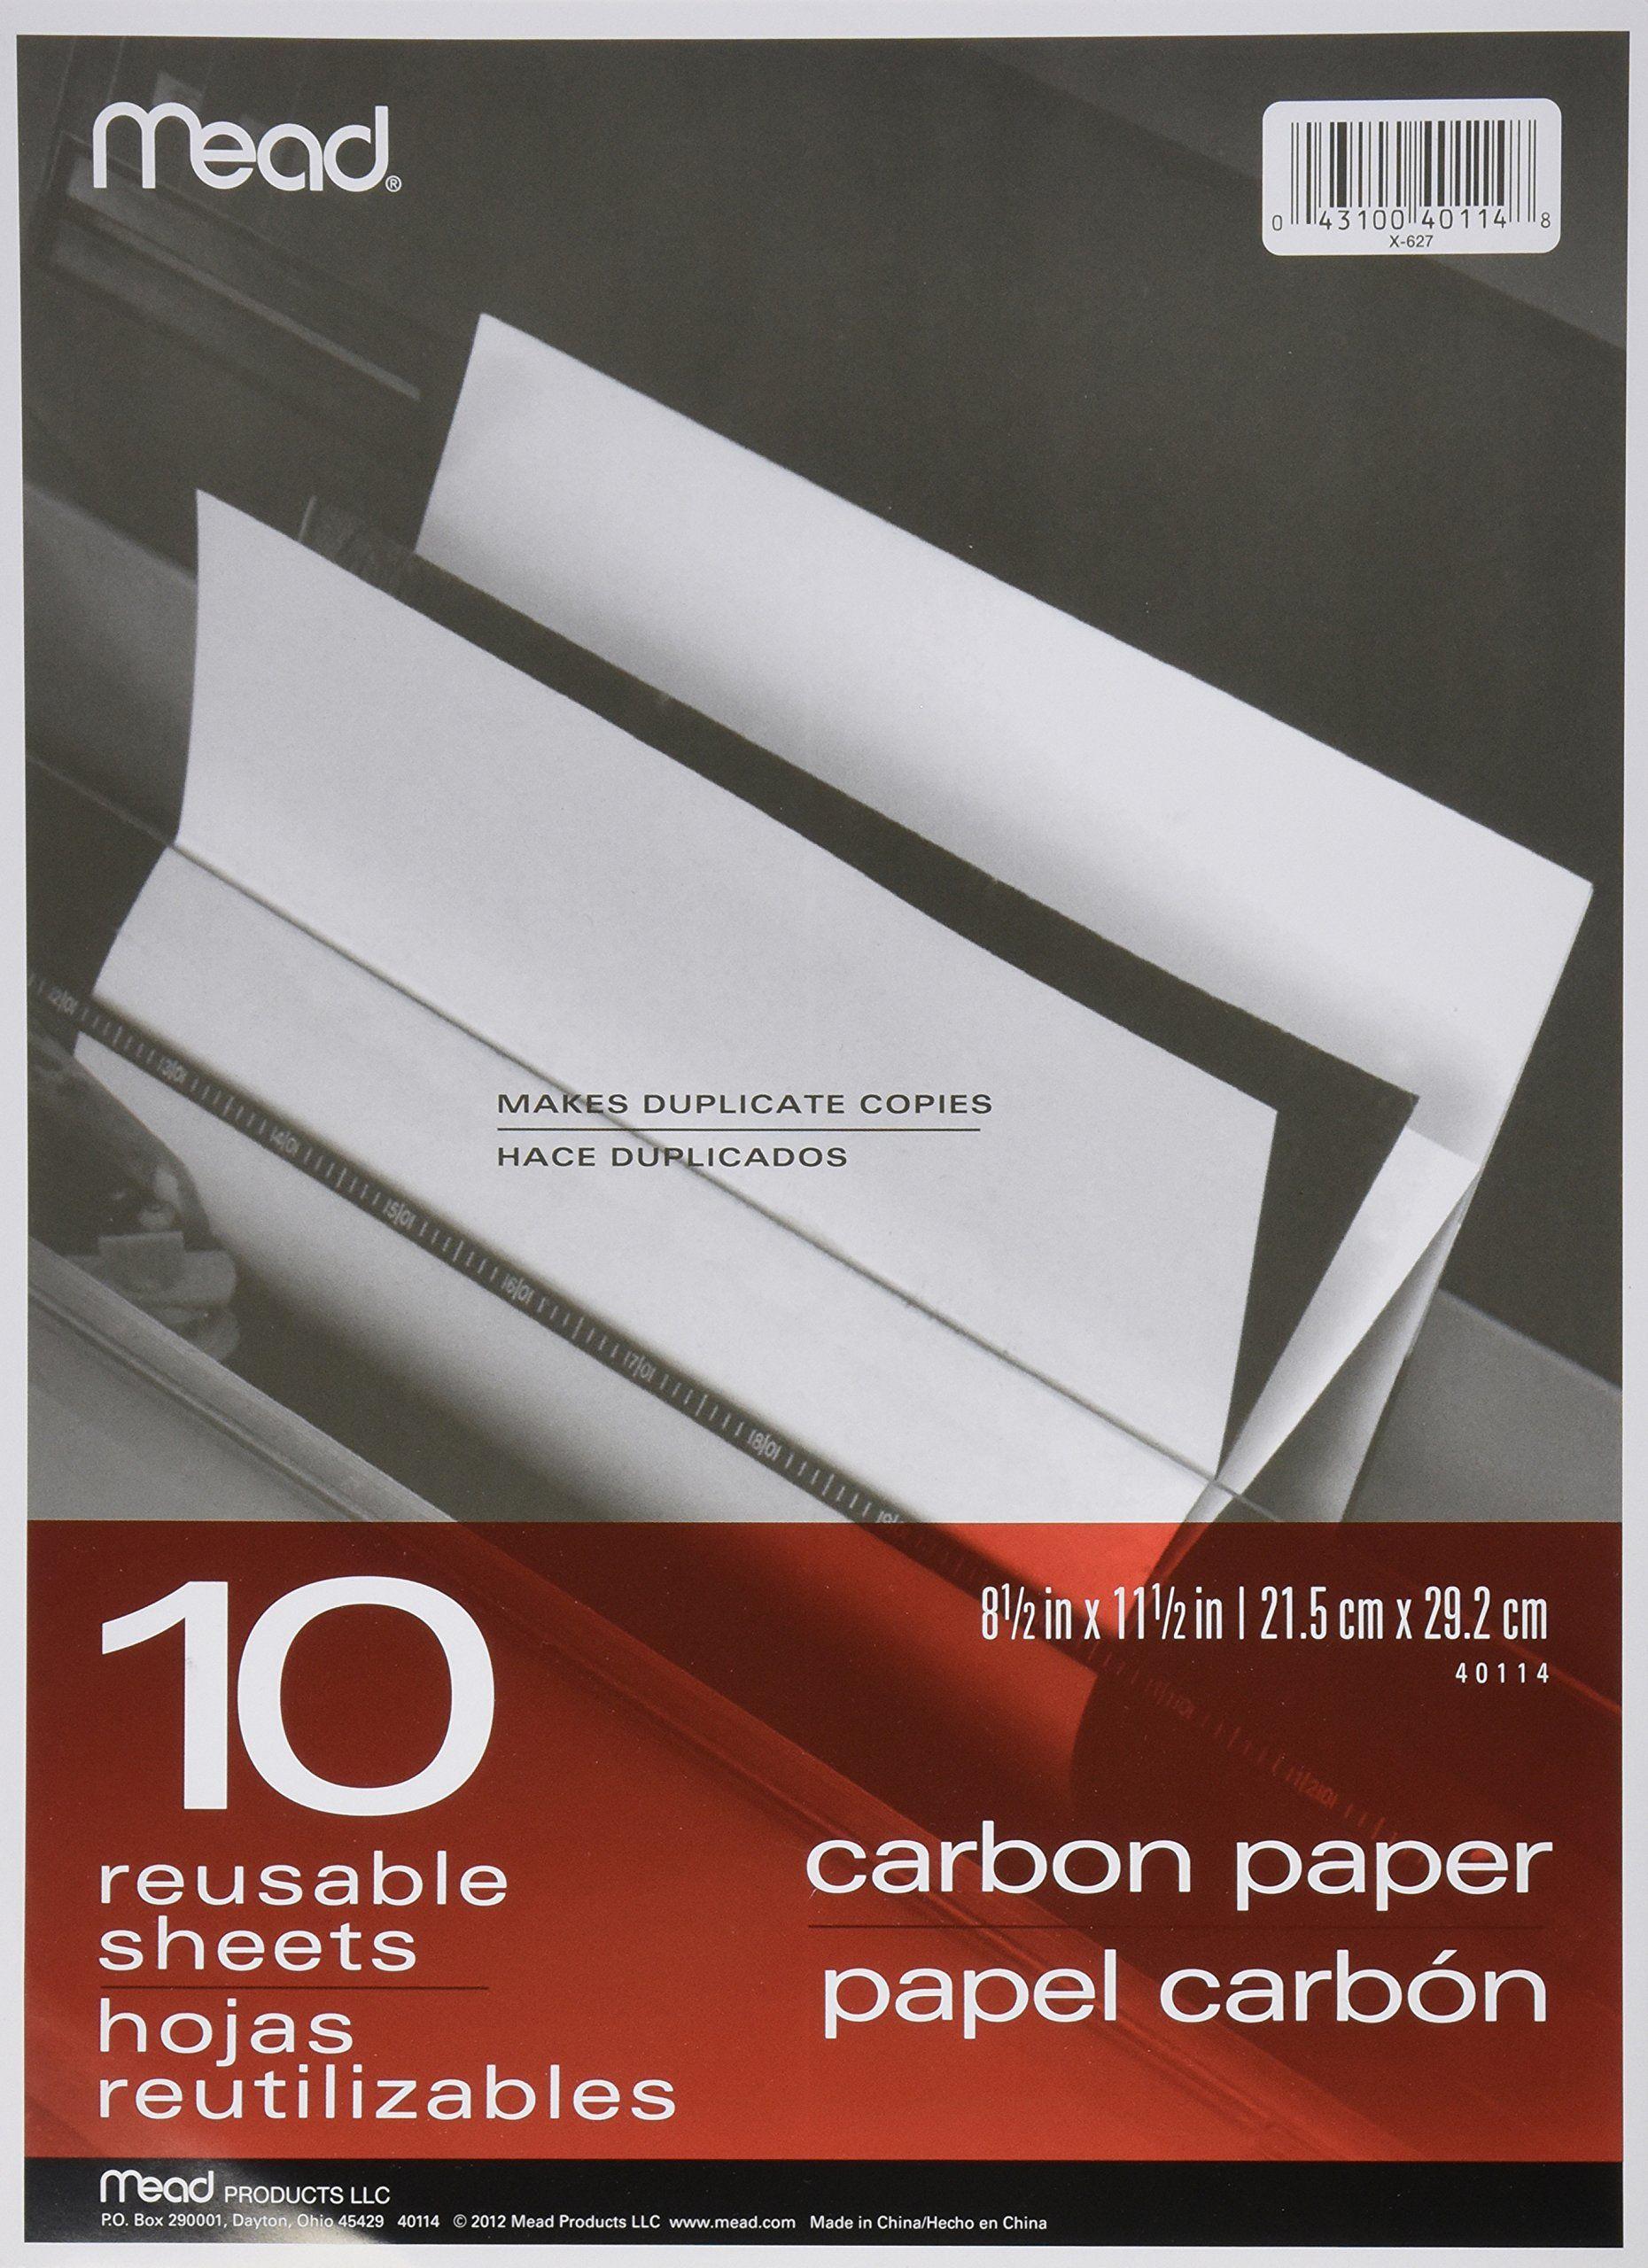 Black carbon mill finish paper 812 x 1112 10 sheets